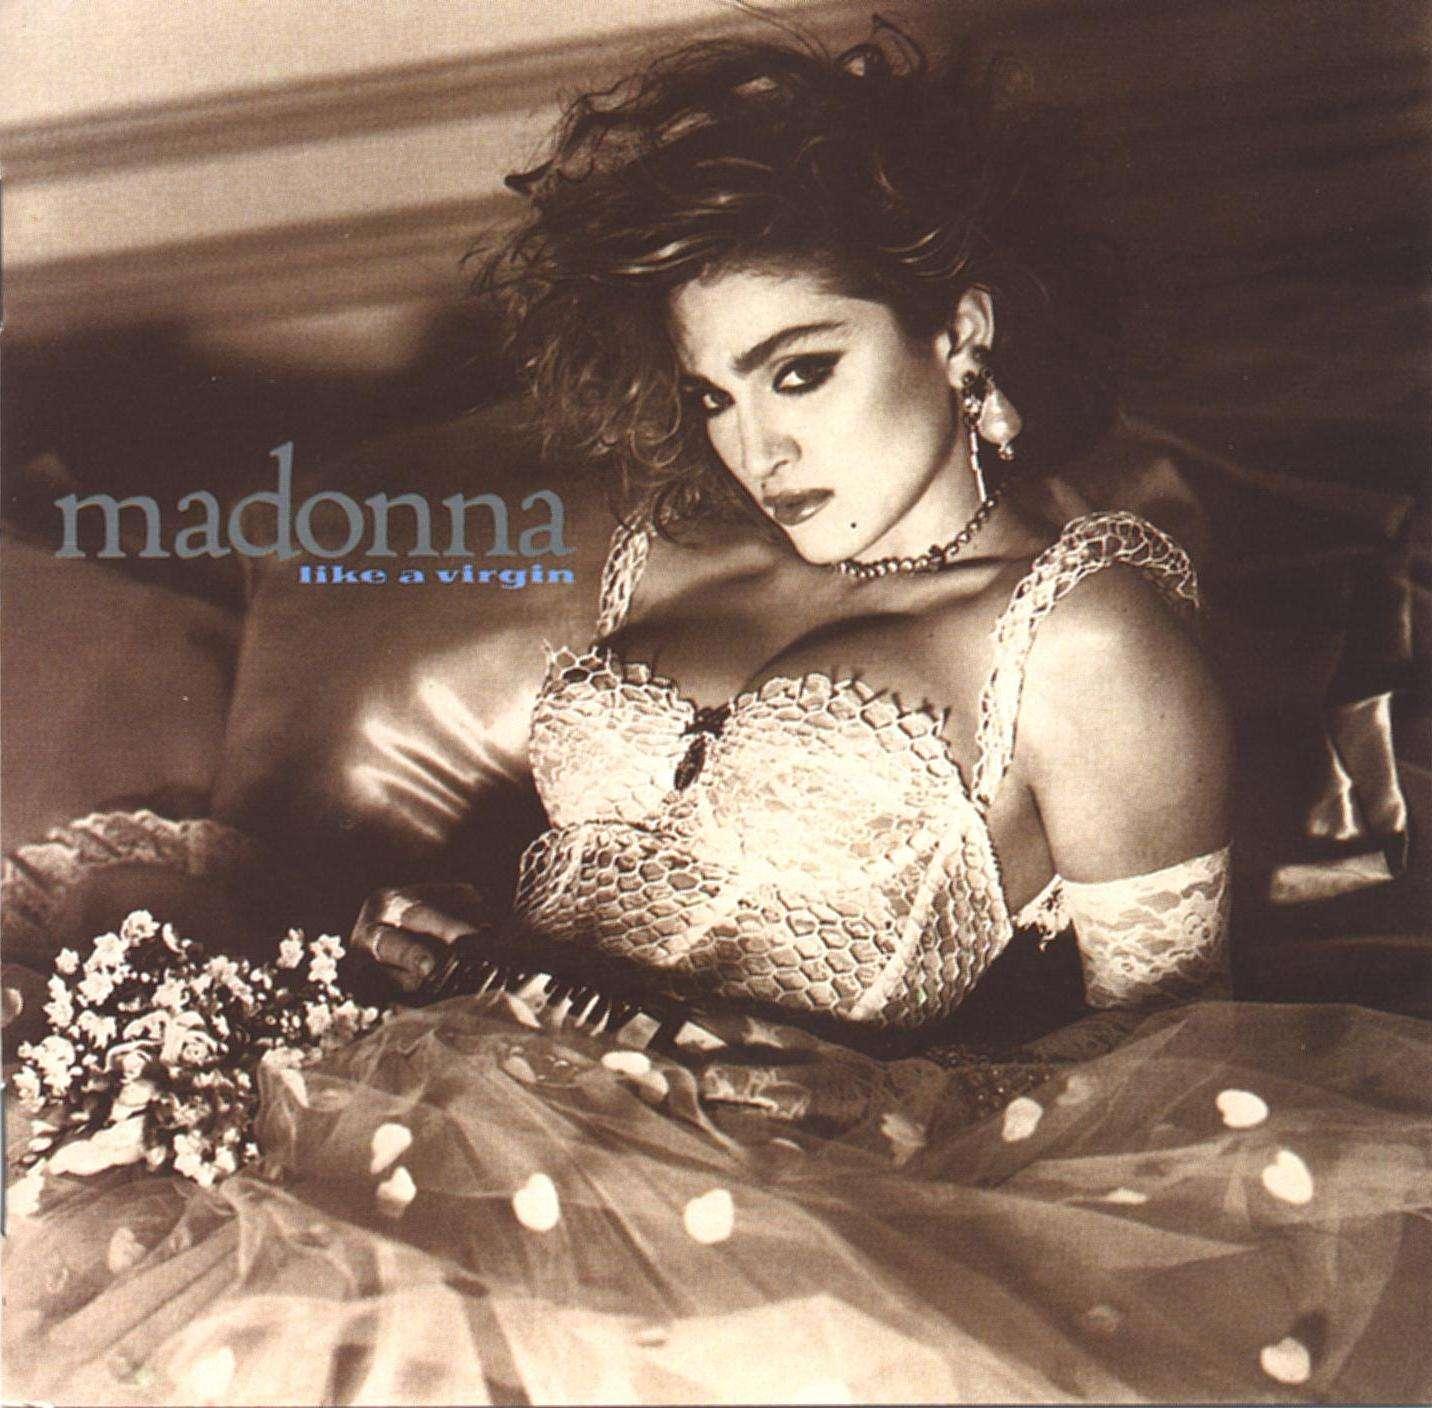 madonna - photo #48